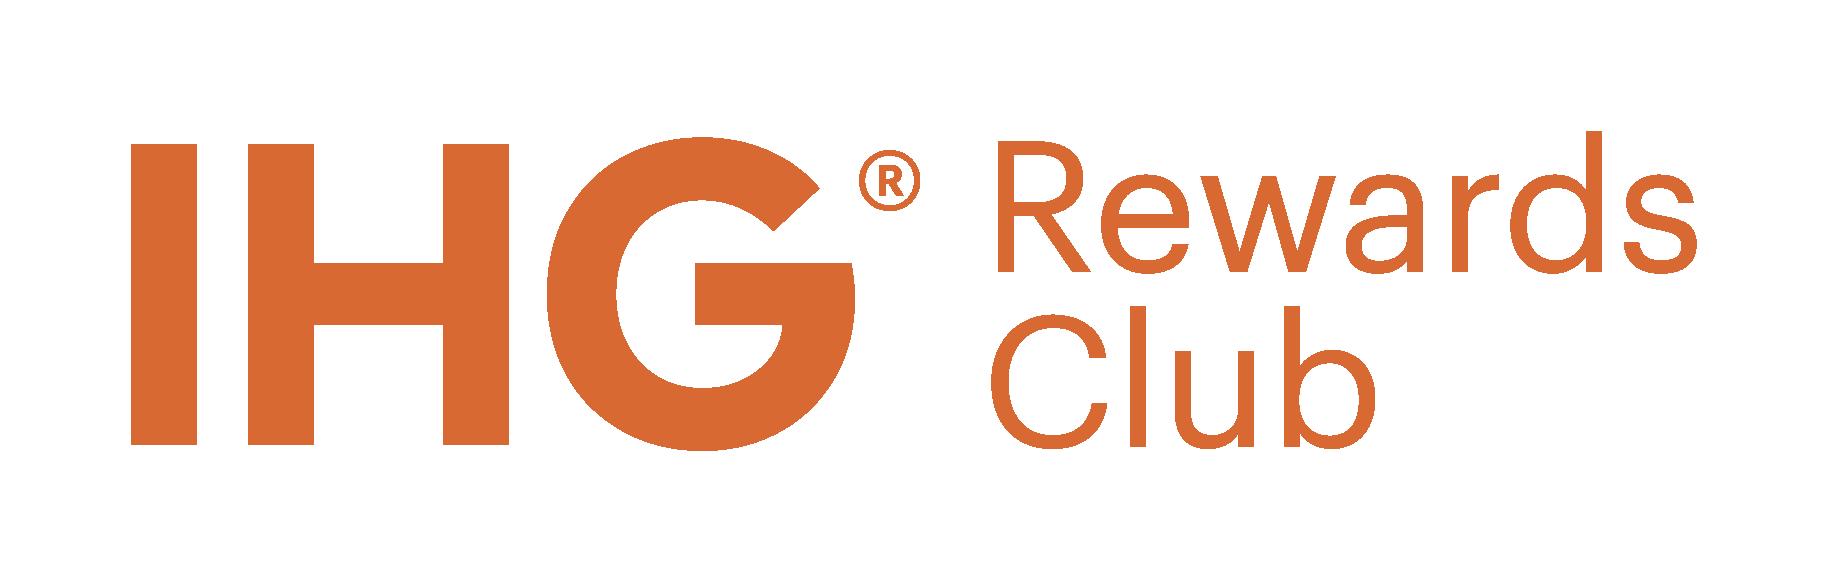 IHG Rewards Club (New).png